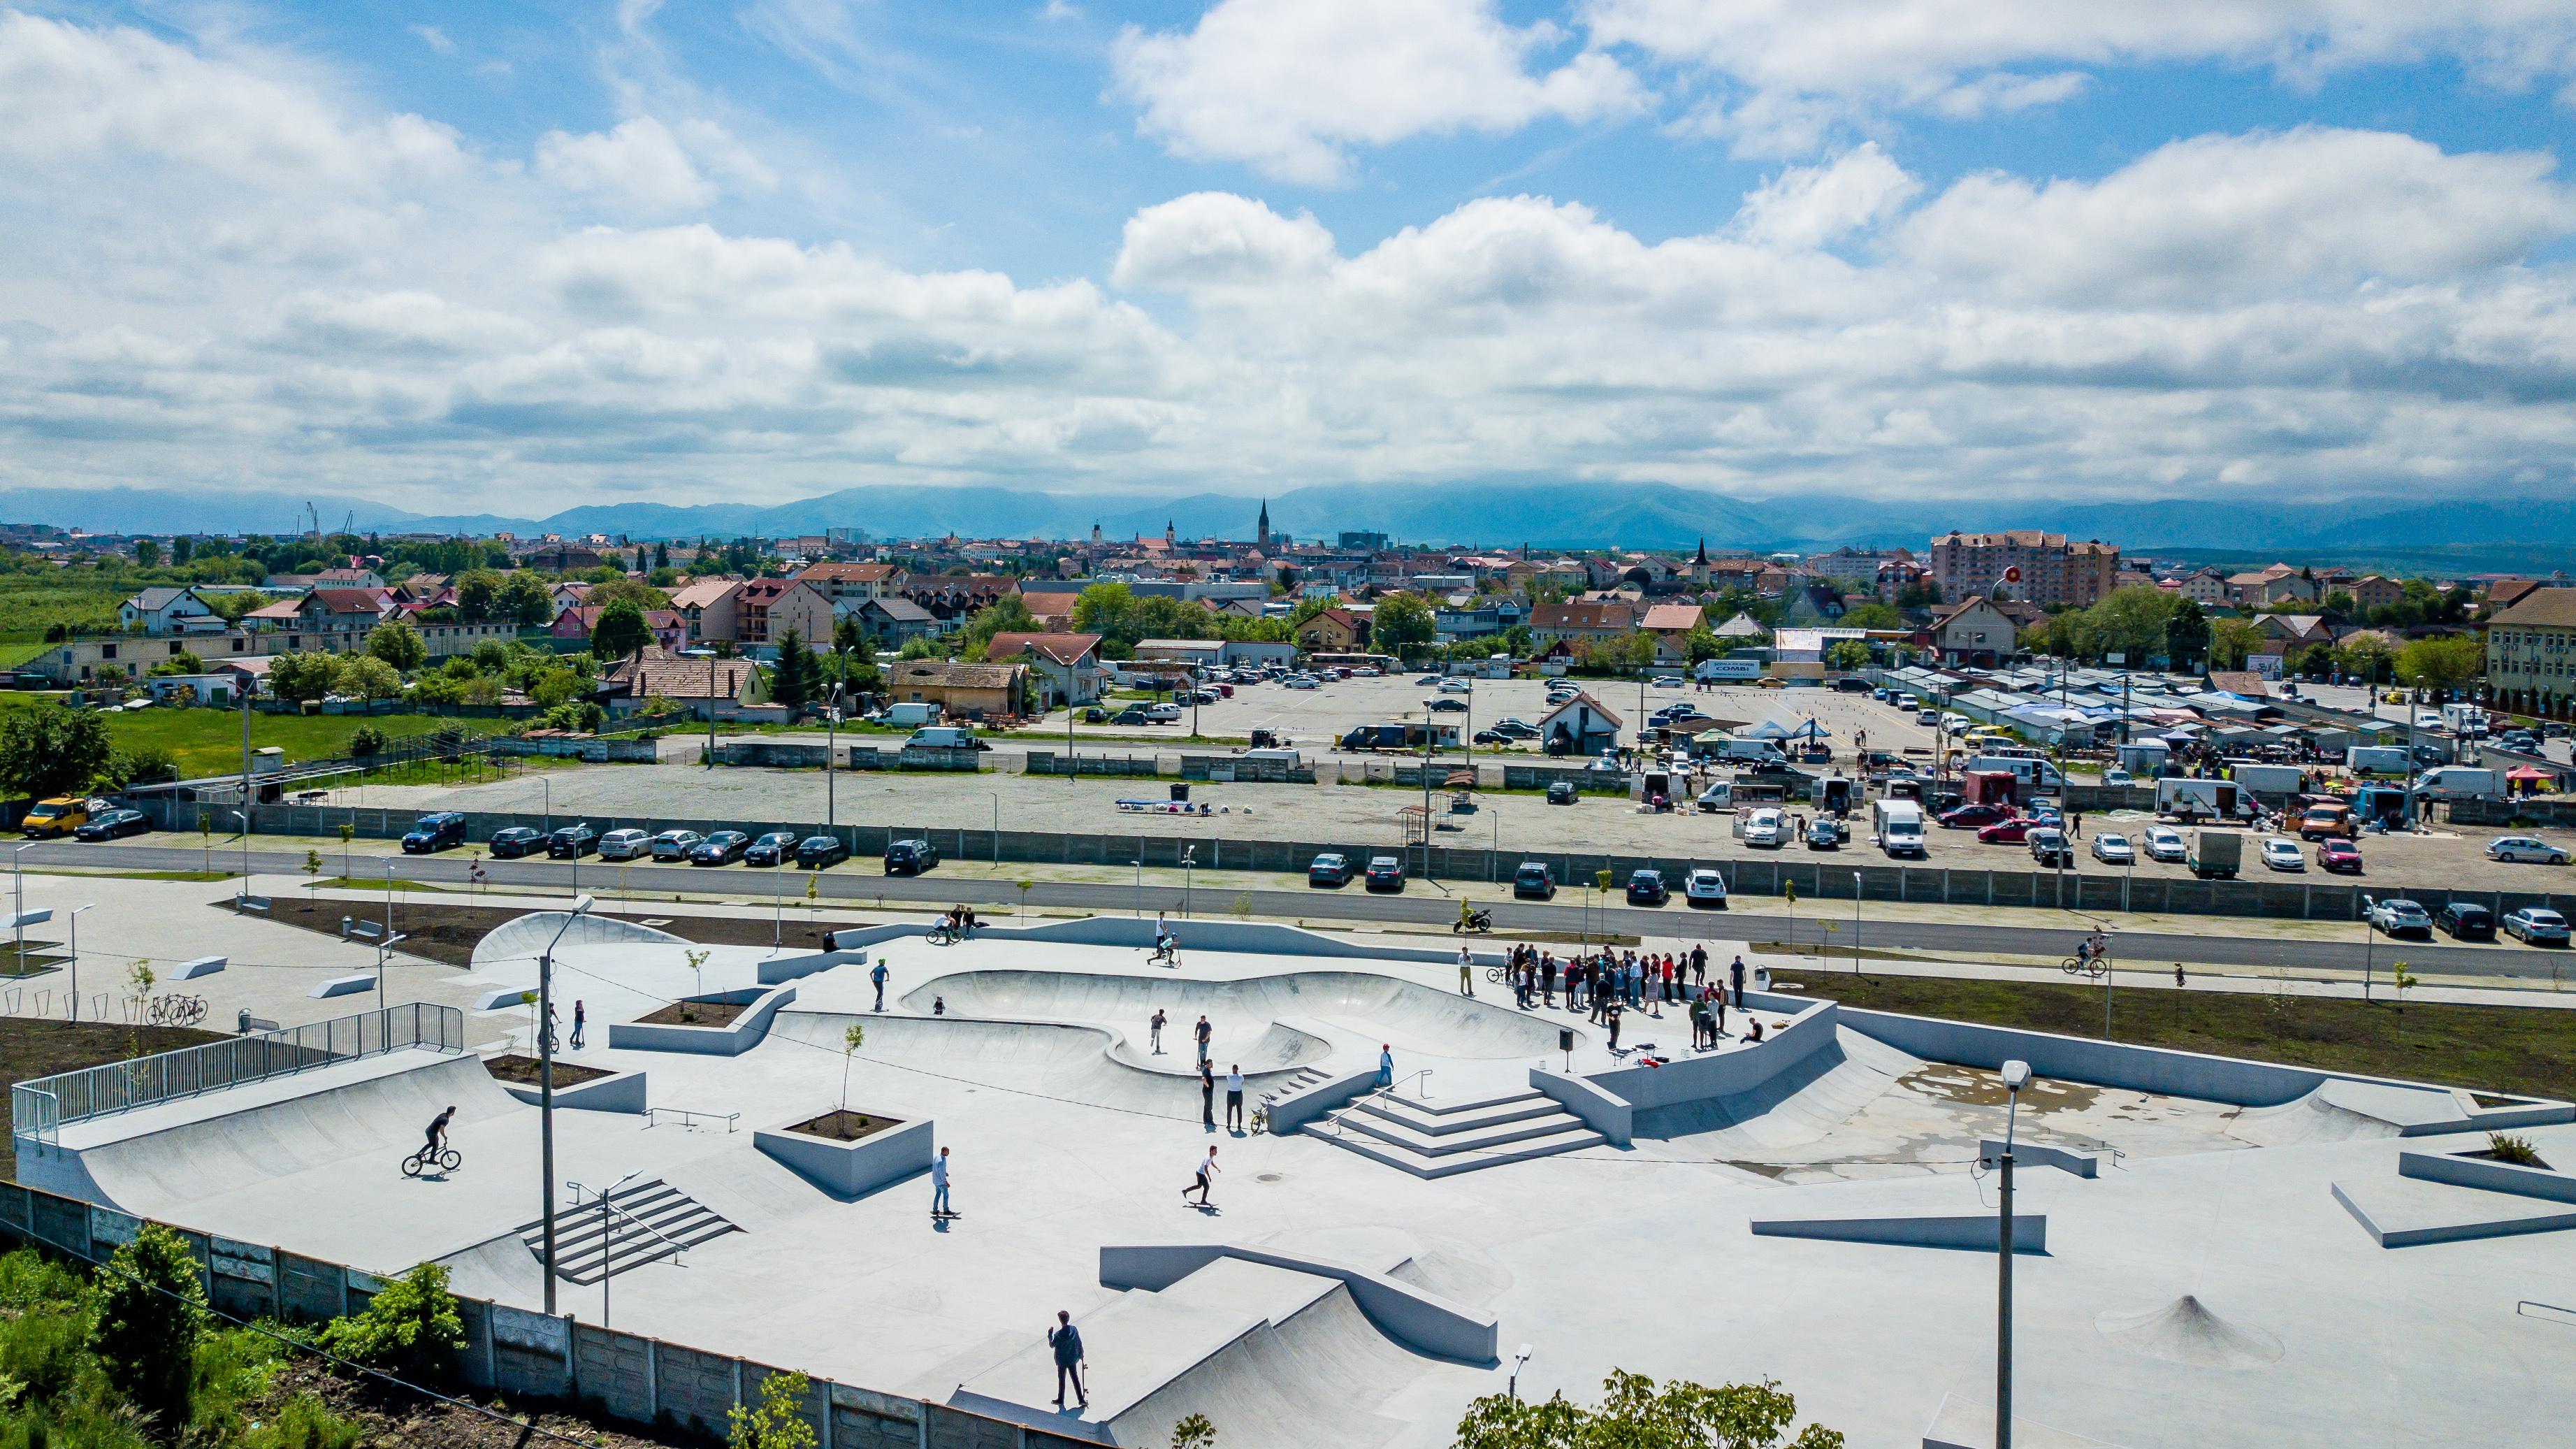 Primăria Sibiu a deschis noul skate park din zona Obor